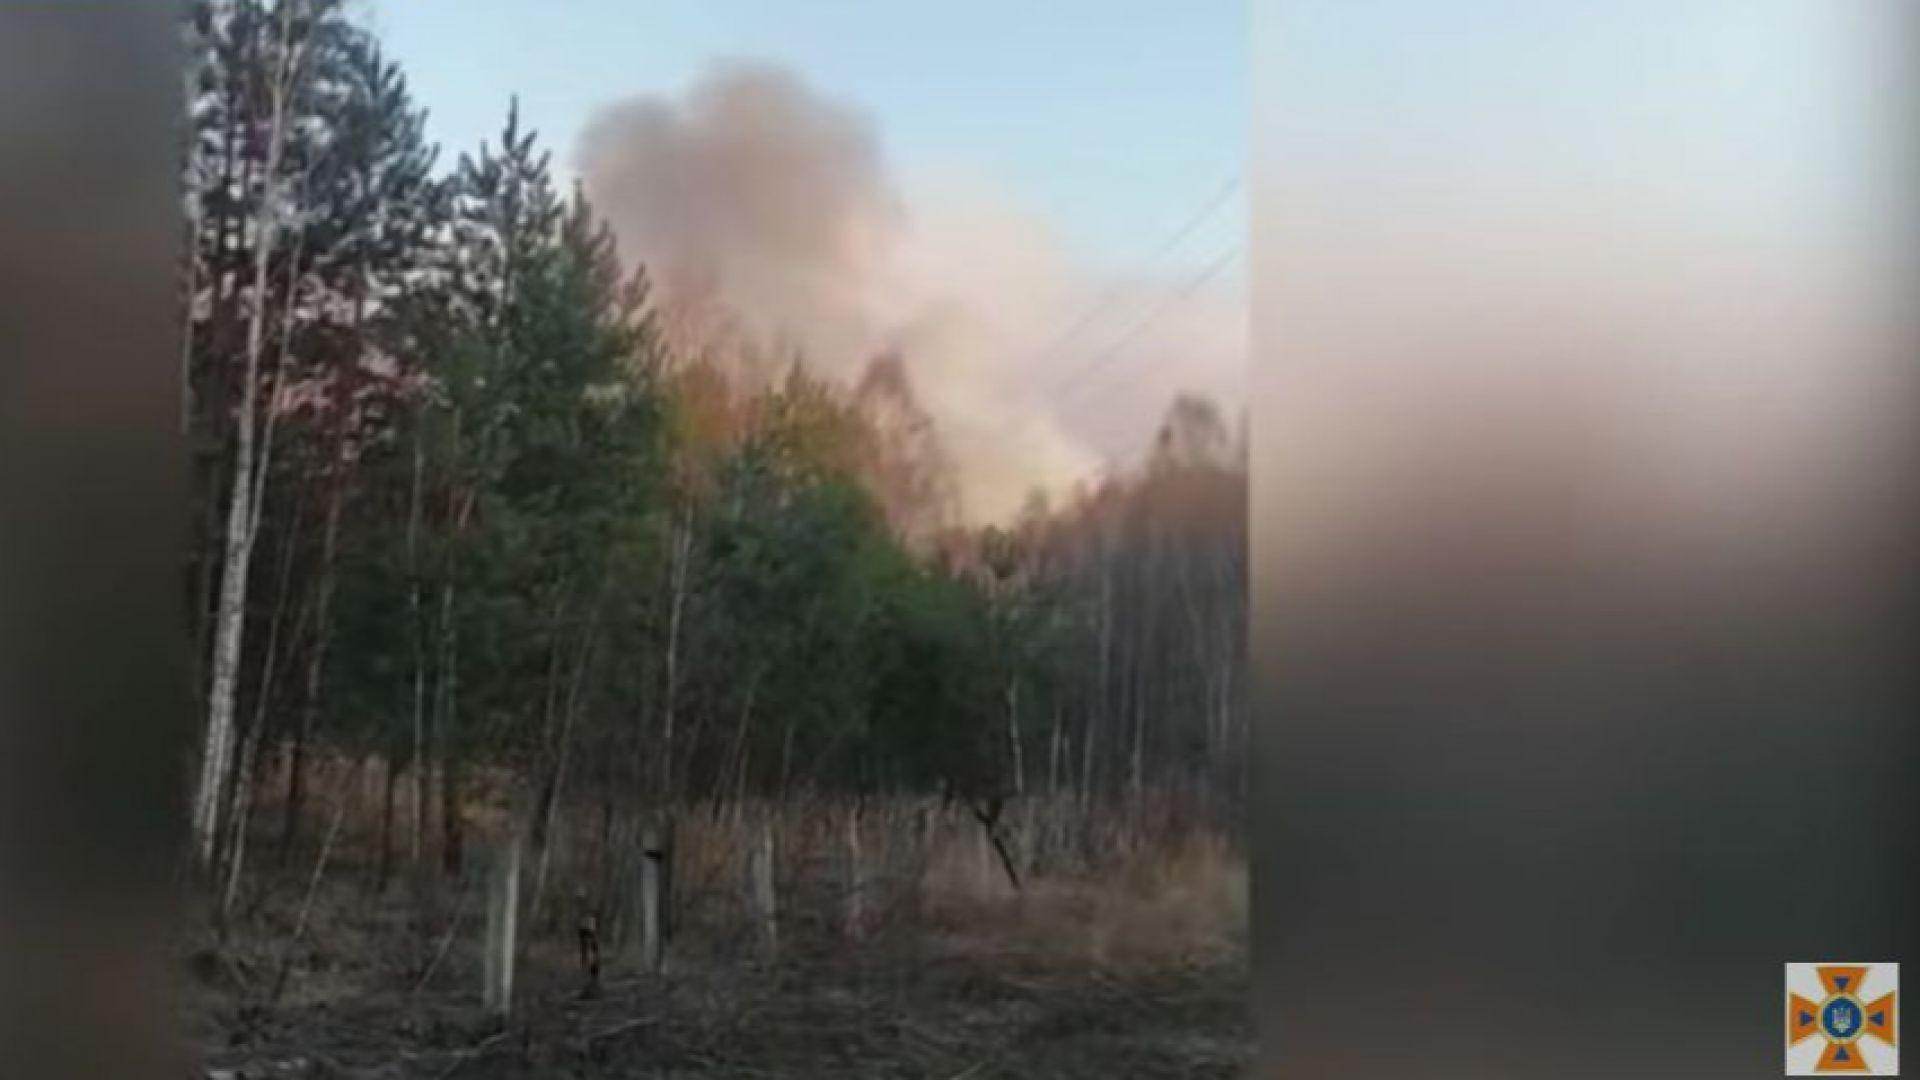 Повишено ниво на радиация заради пожар край Чернобил (видео)